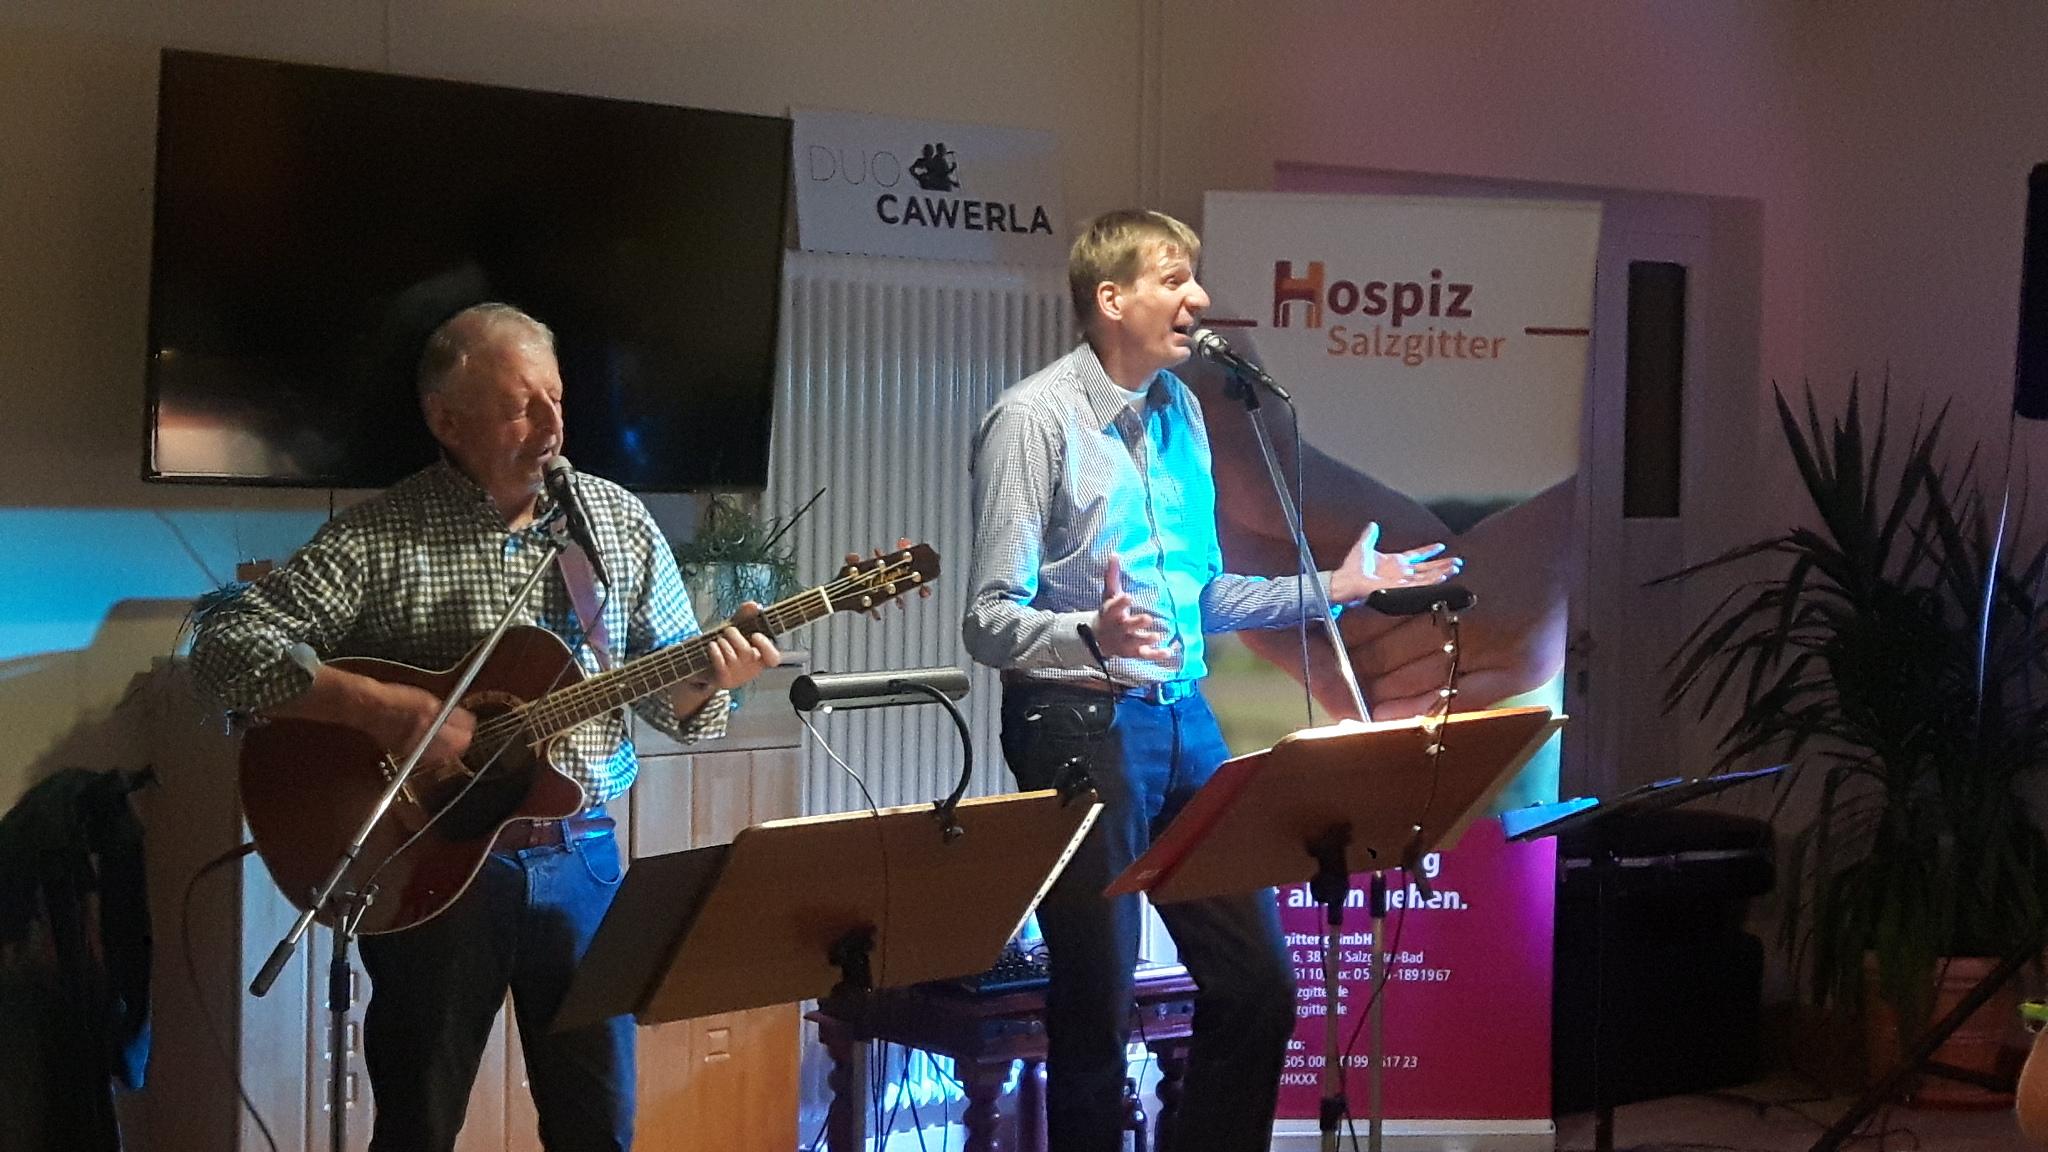 Hospiz Salzgitter Duo Cawerla